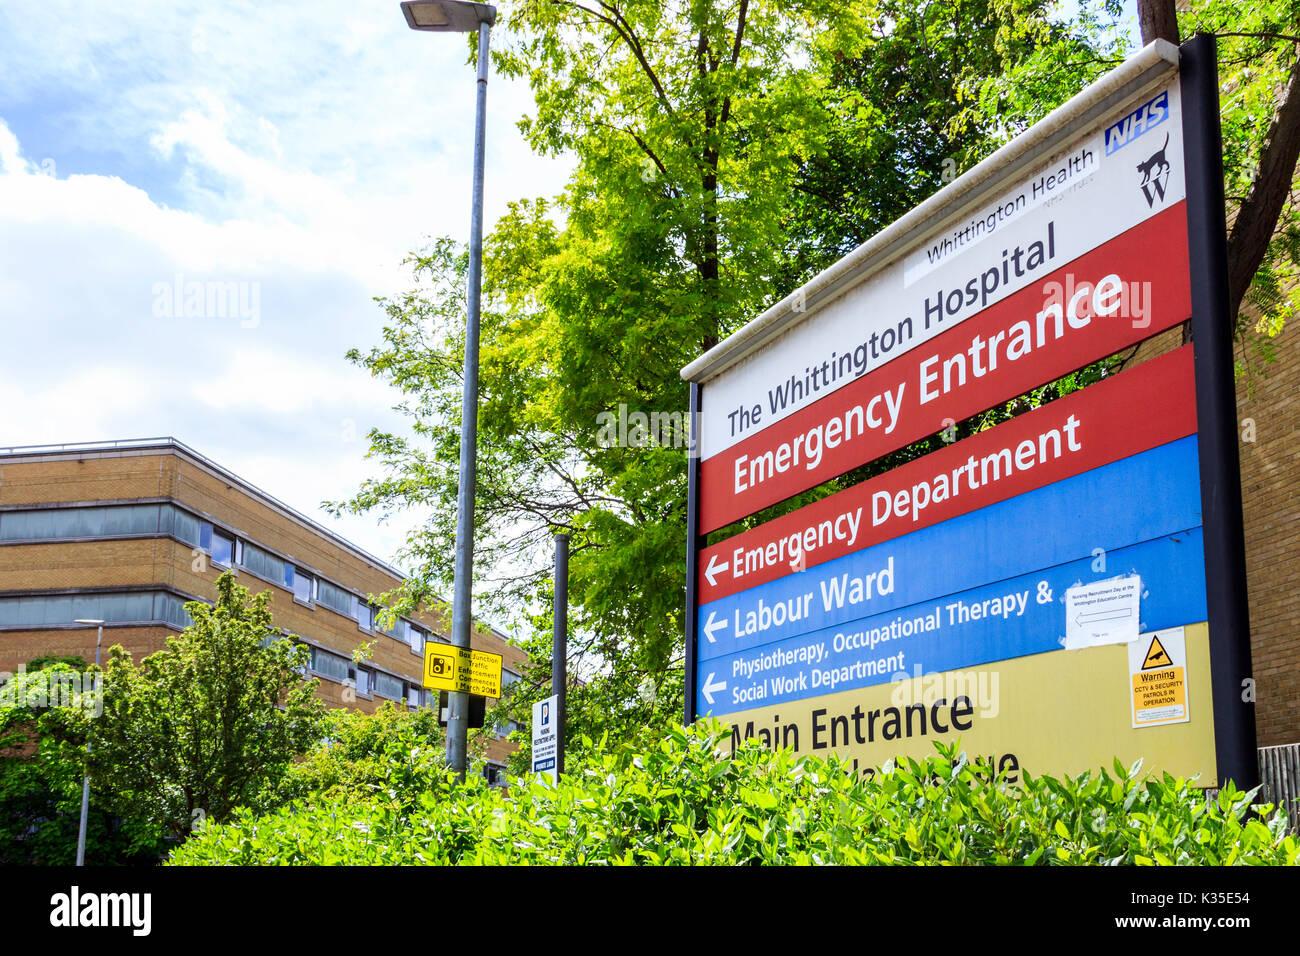 Informational sign showing the Emergency Entrance of the Whittington Hospital, Archway, North London, UK - Stock Image